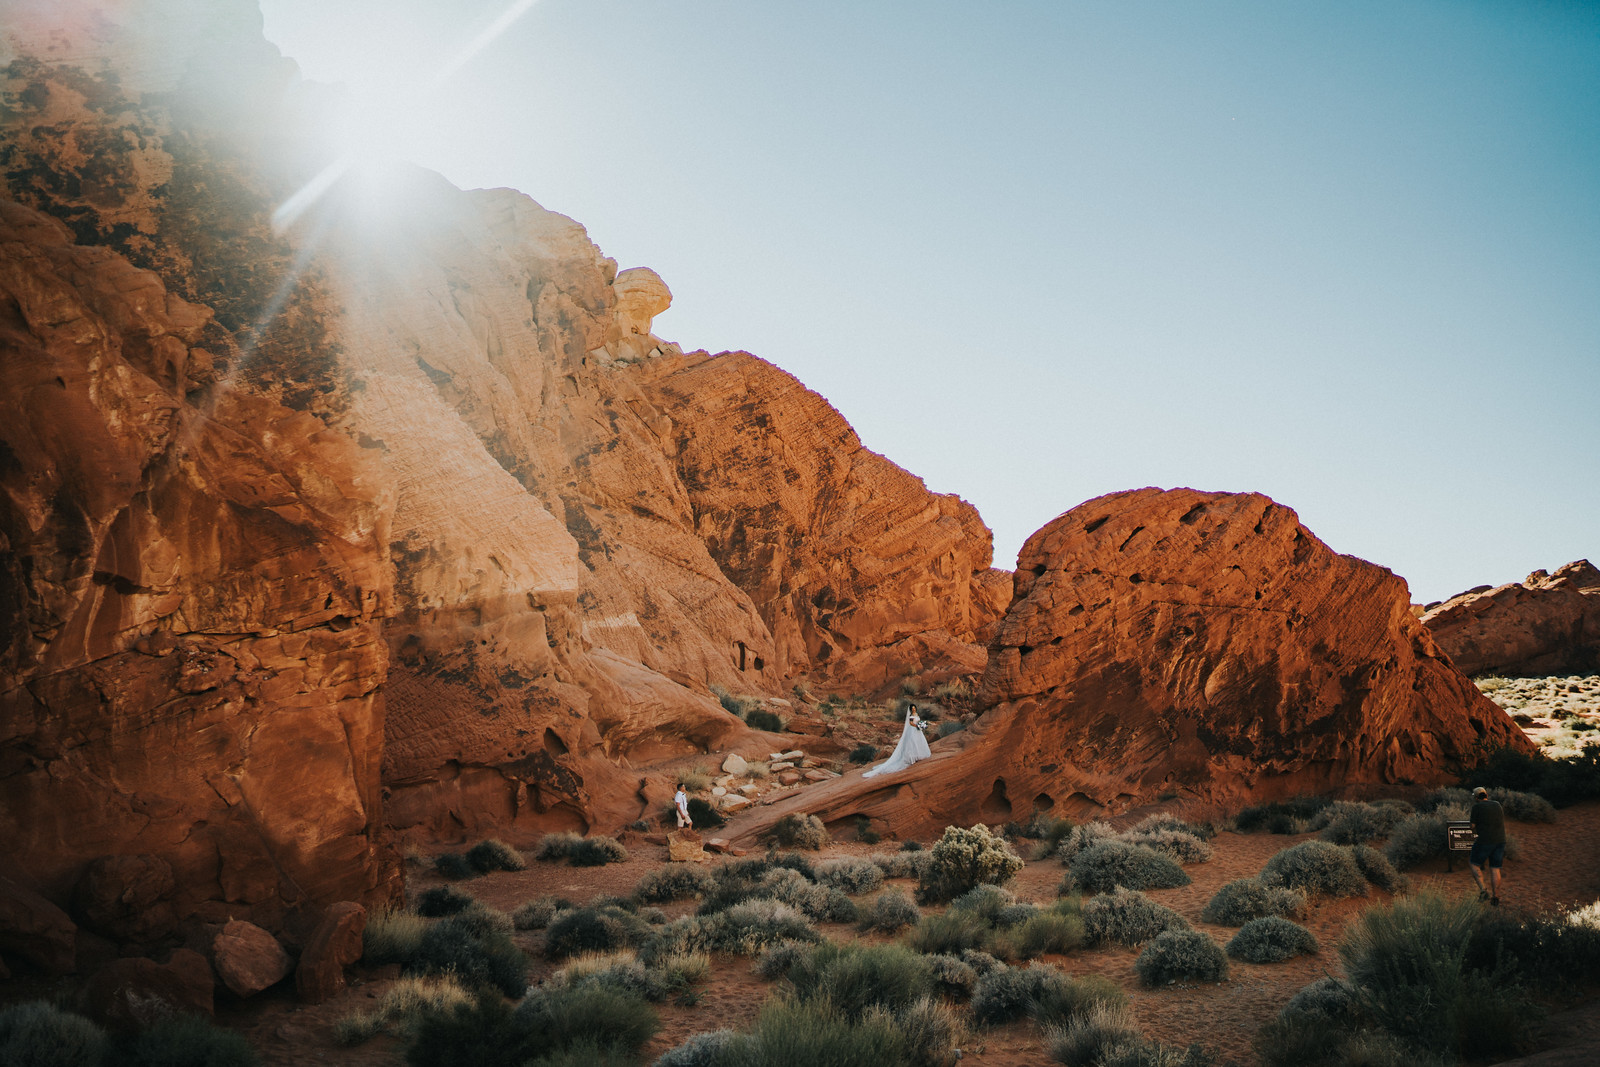 The couple walk around the mountain rock of their venue